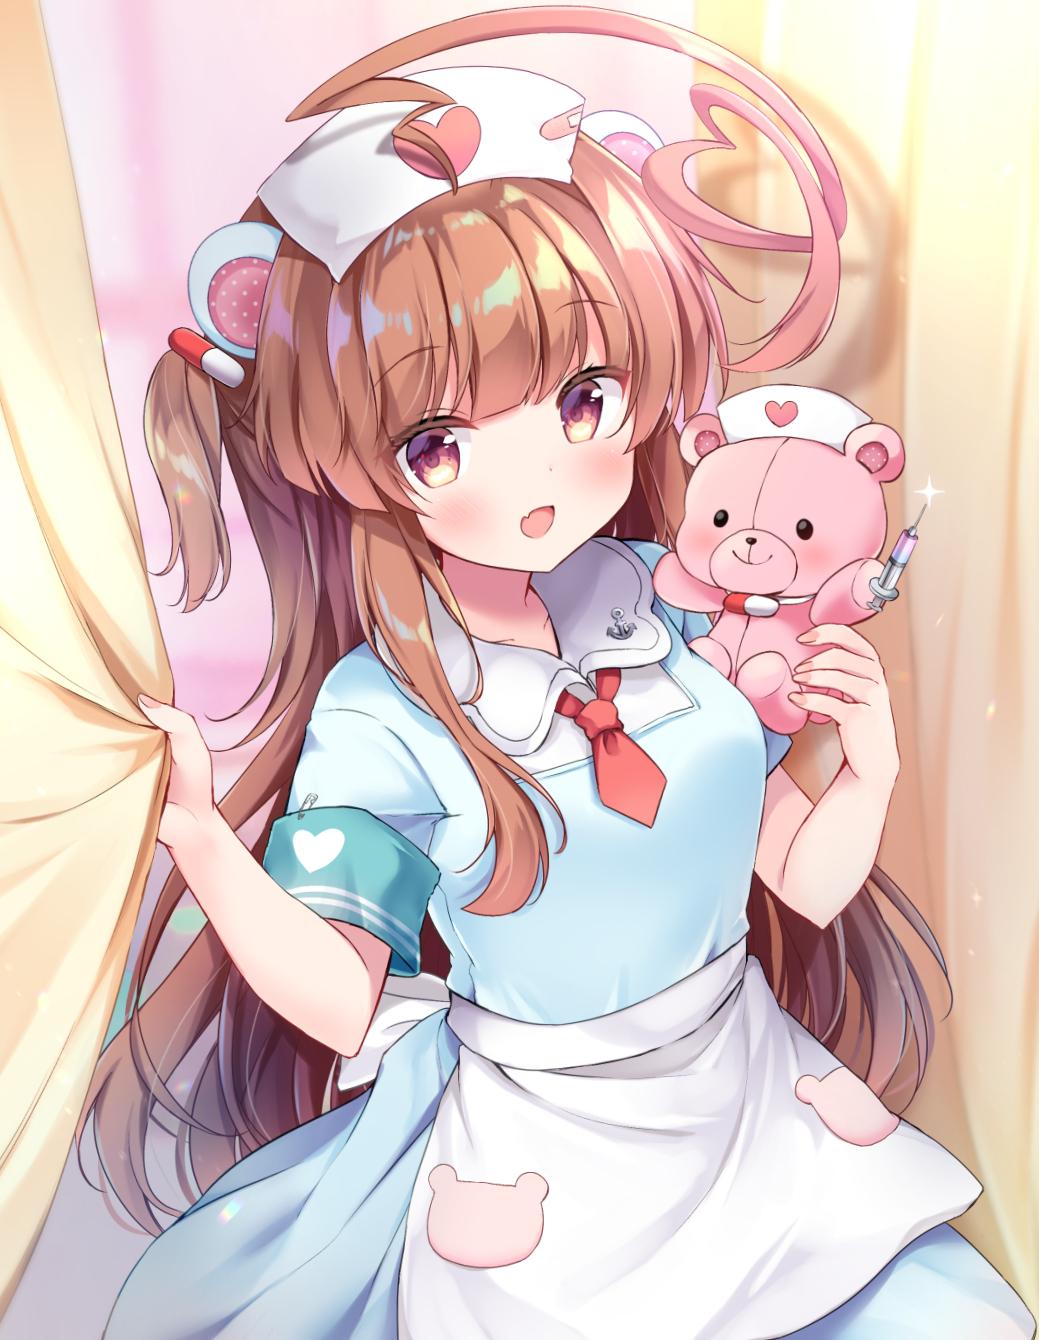 【P站画师】萌妹子!好多萌妹子!日本画师まさよ的插画作品- m.chinavegors.com